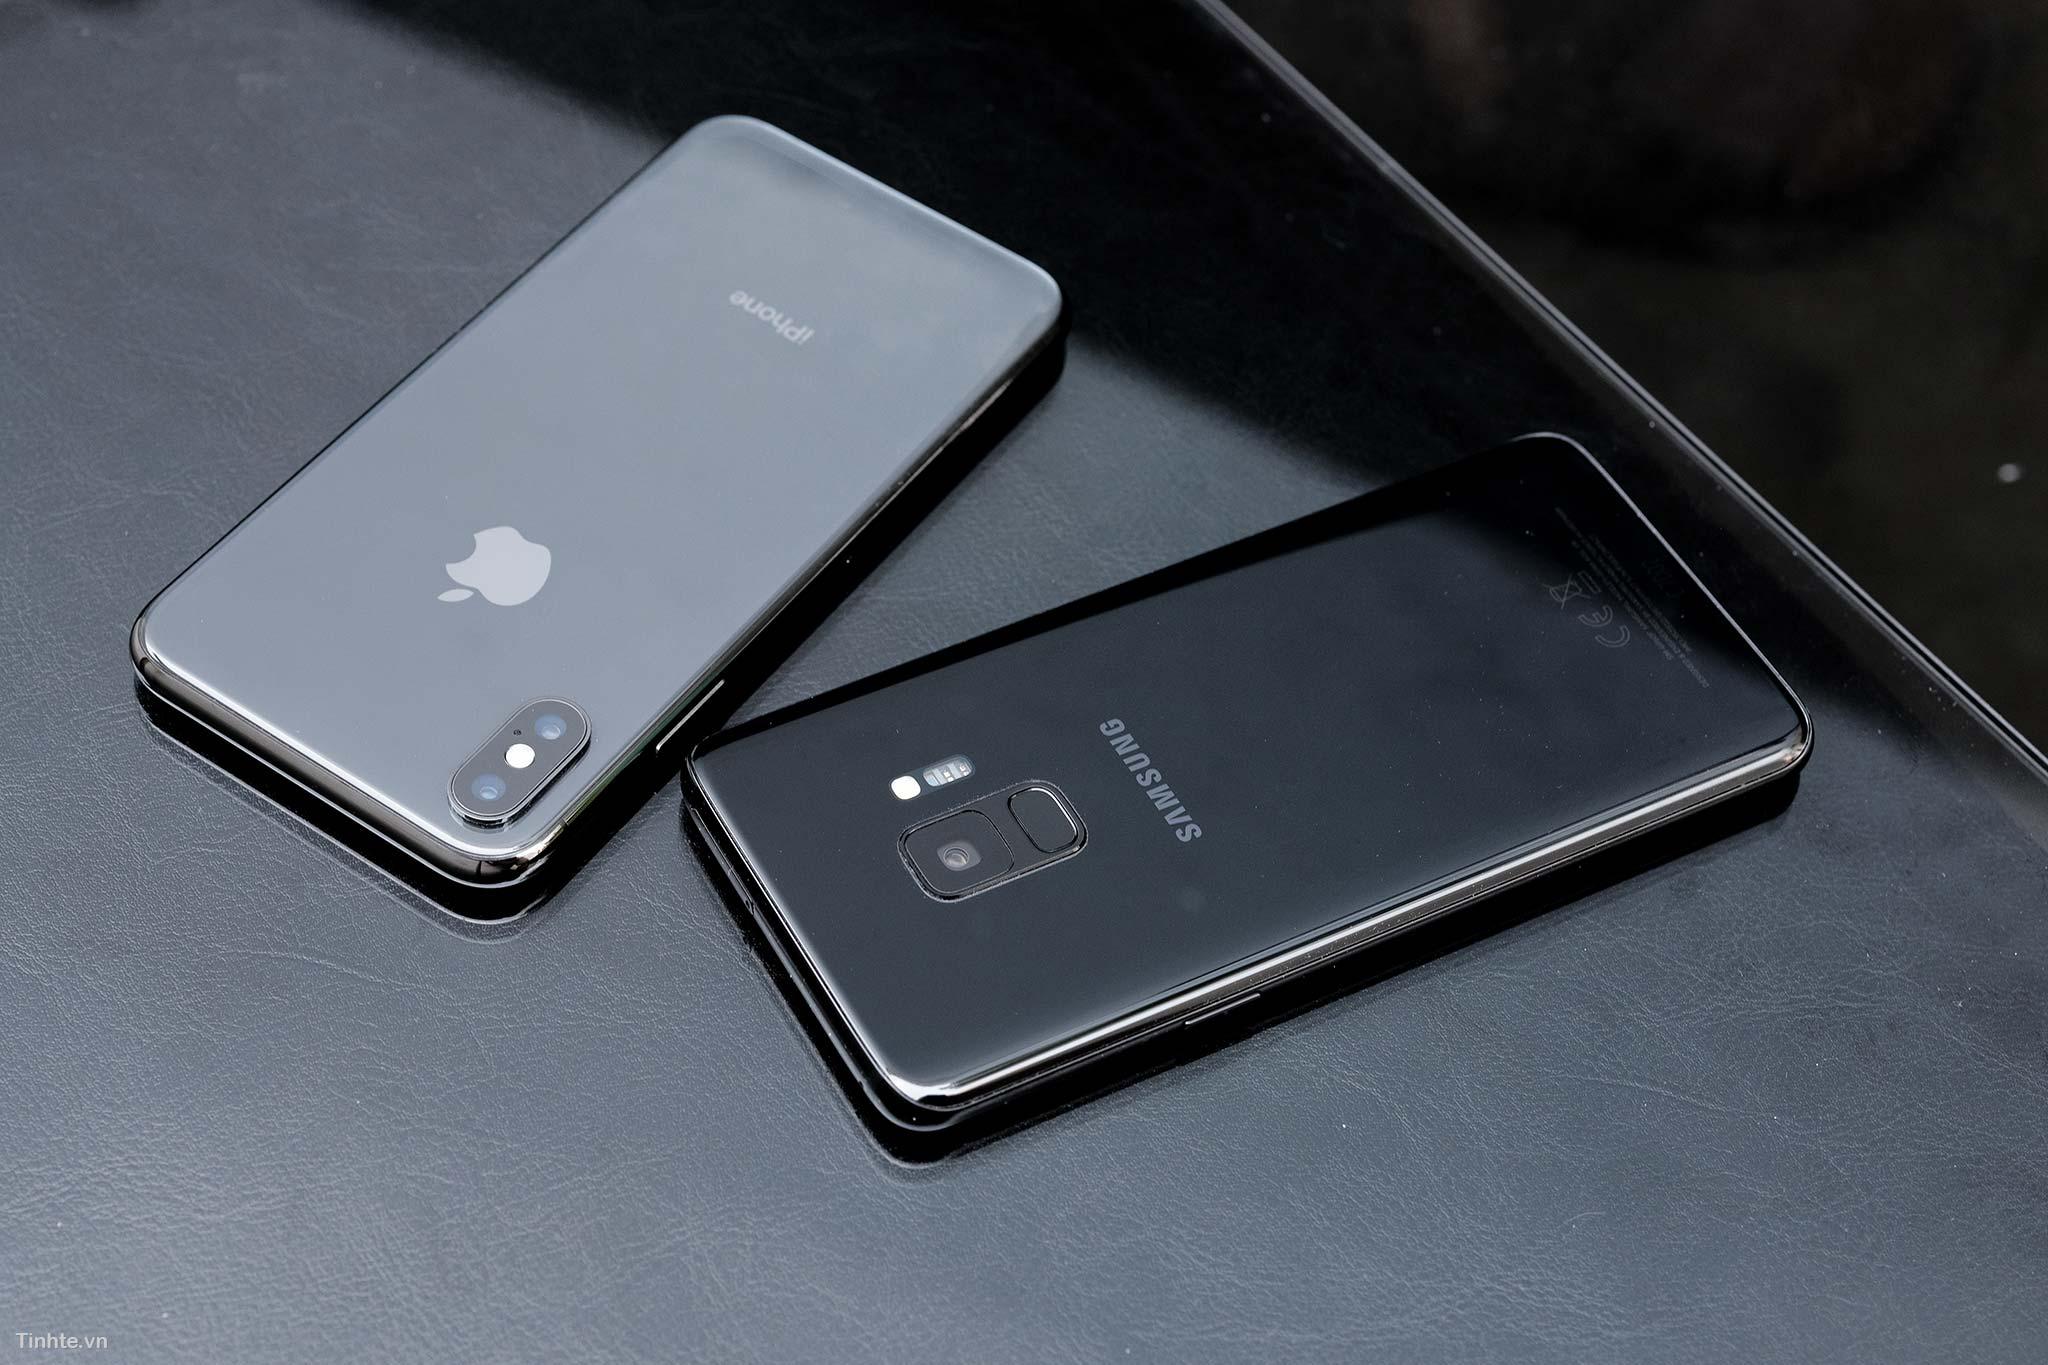 tinhte_samsung_galaxy_s9_apple_iphone_x_3.jpg